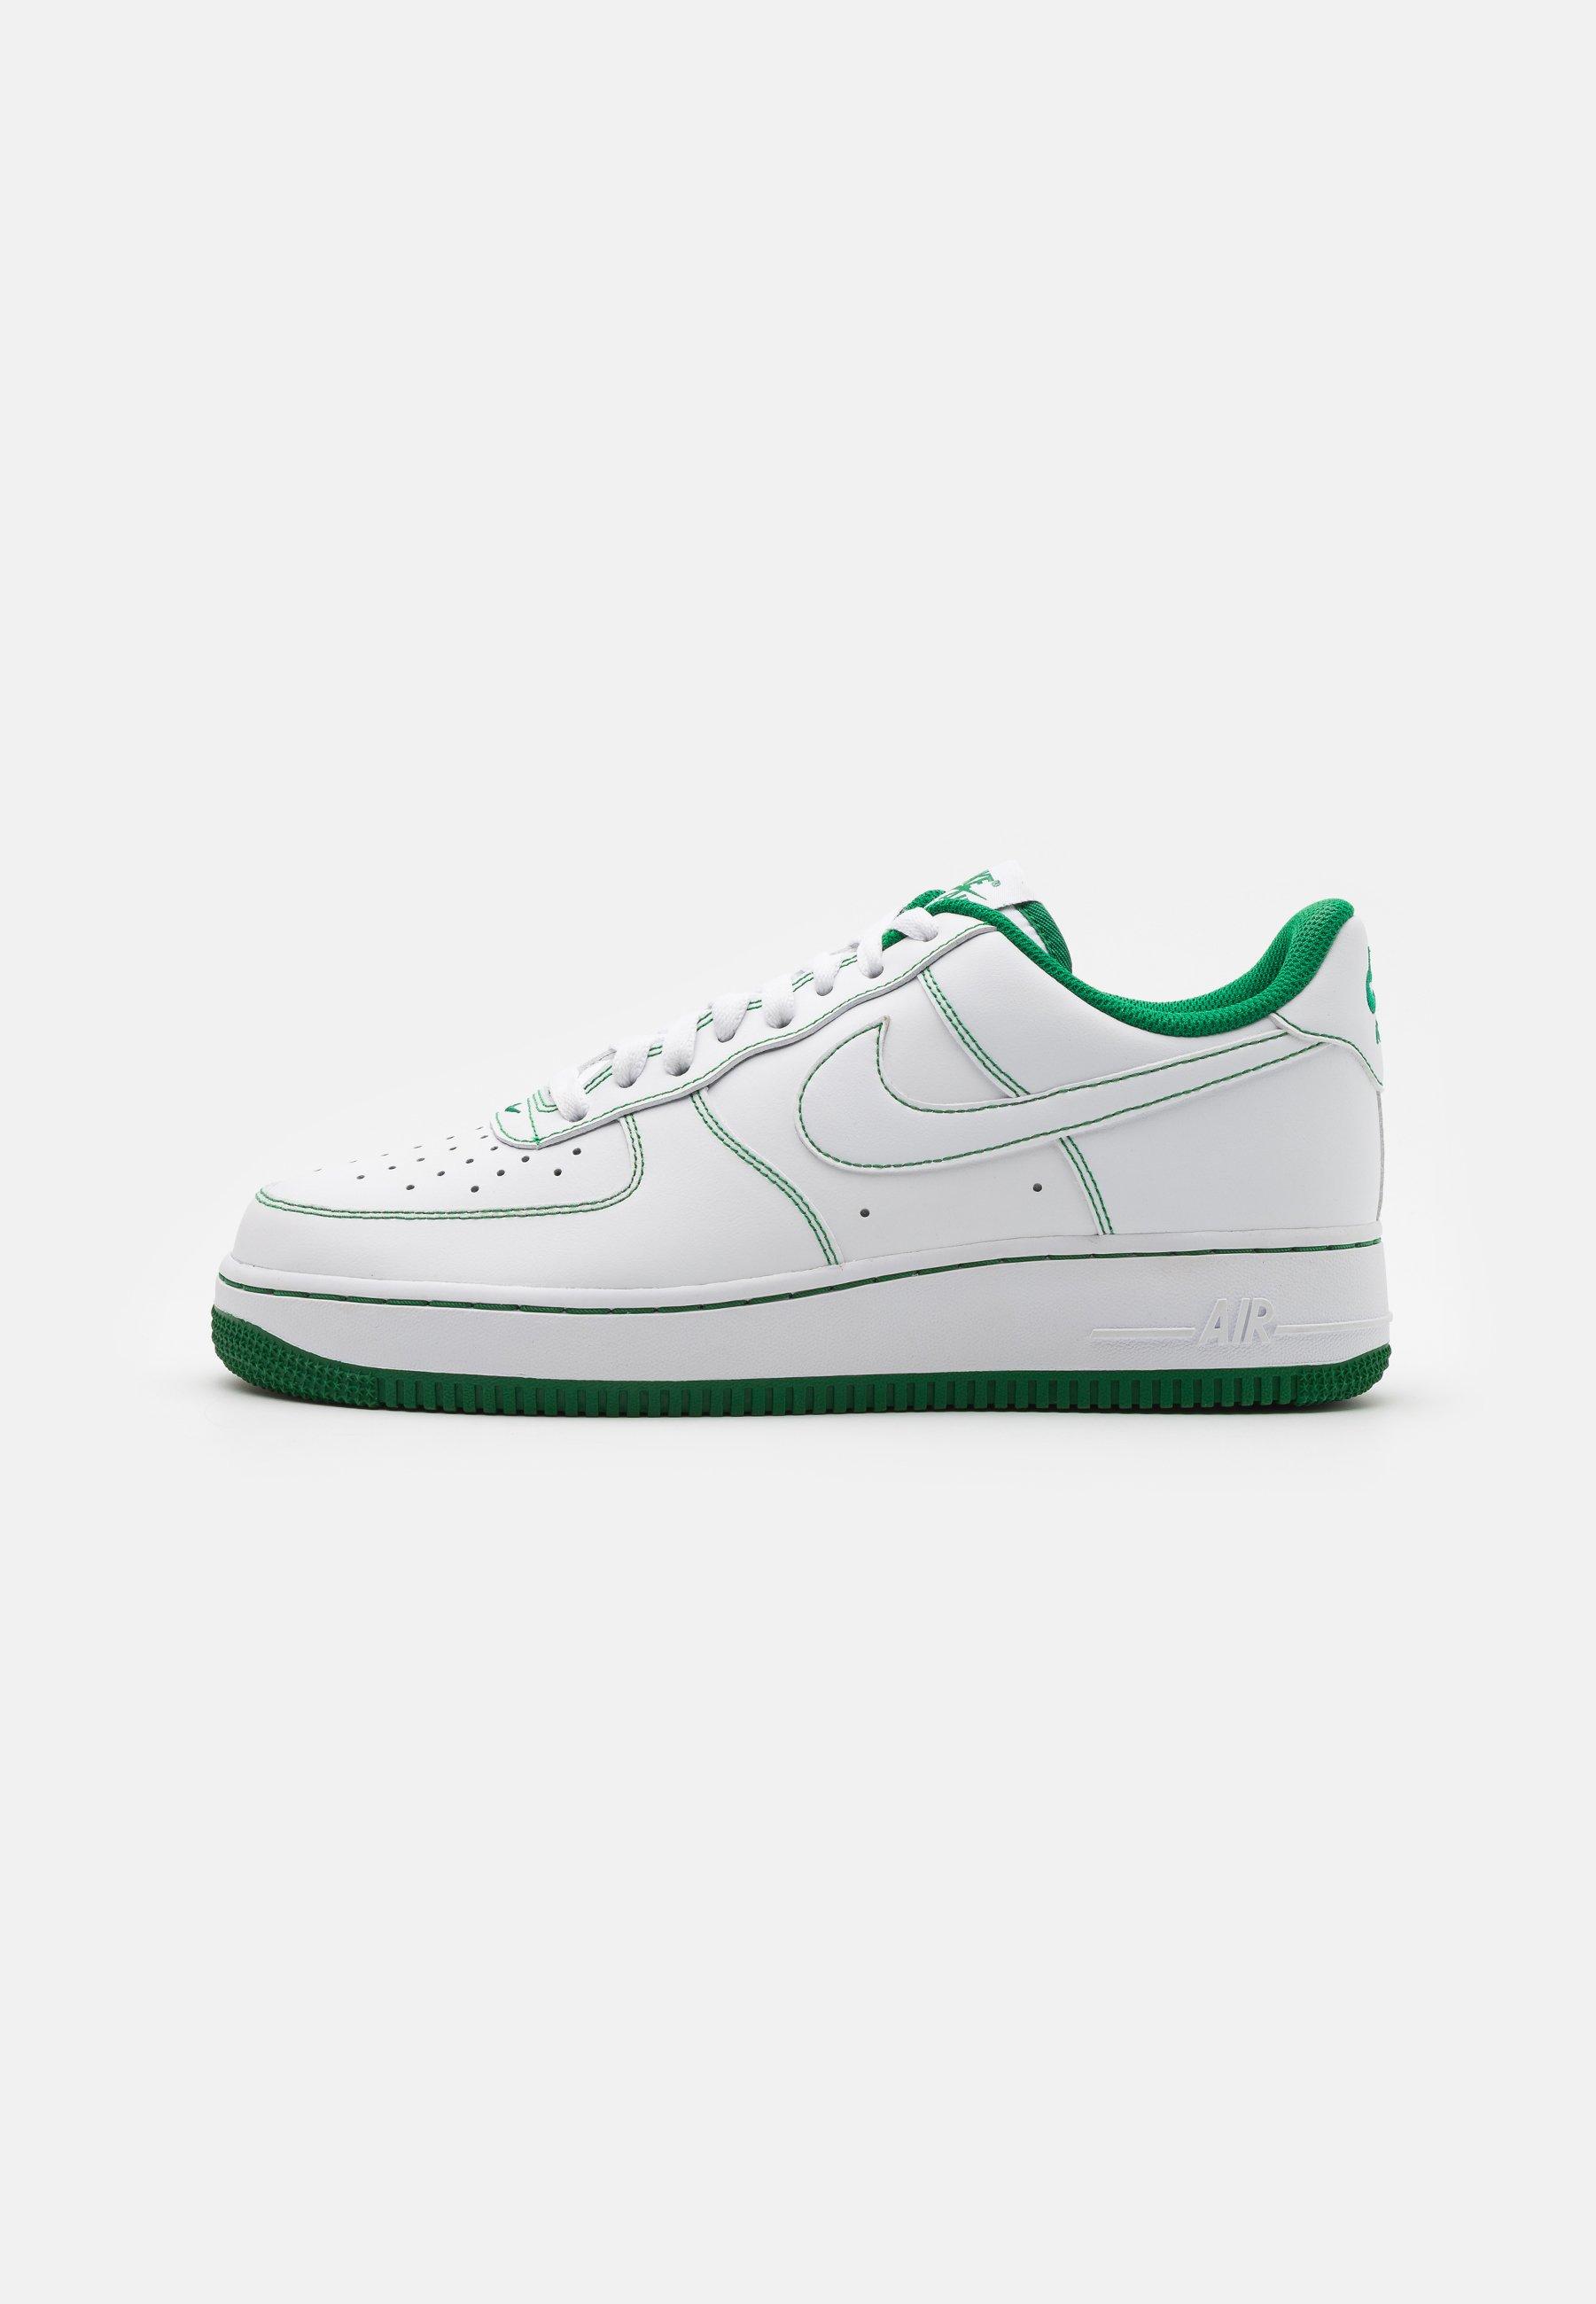 Nike Sportswear Air Force 1 07 Stitch Trainers White Pine Green White Zalando Ie